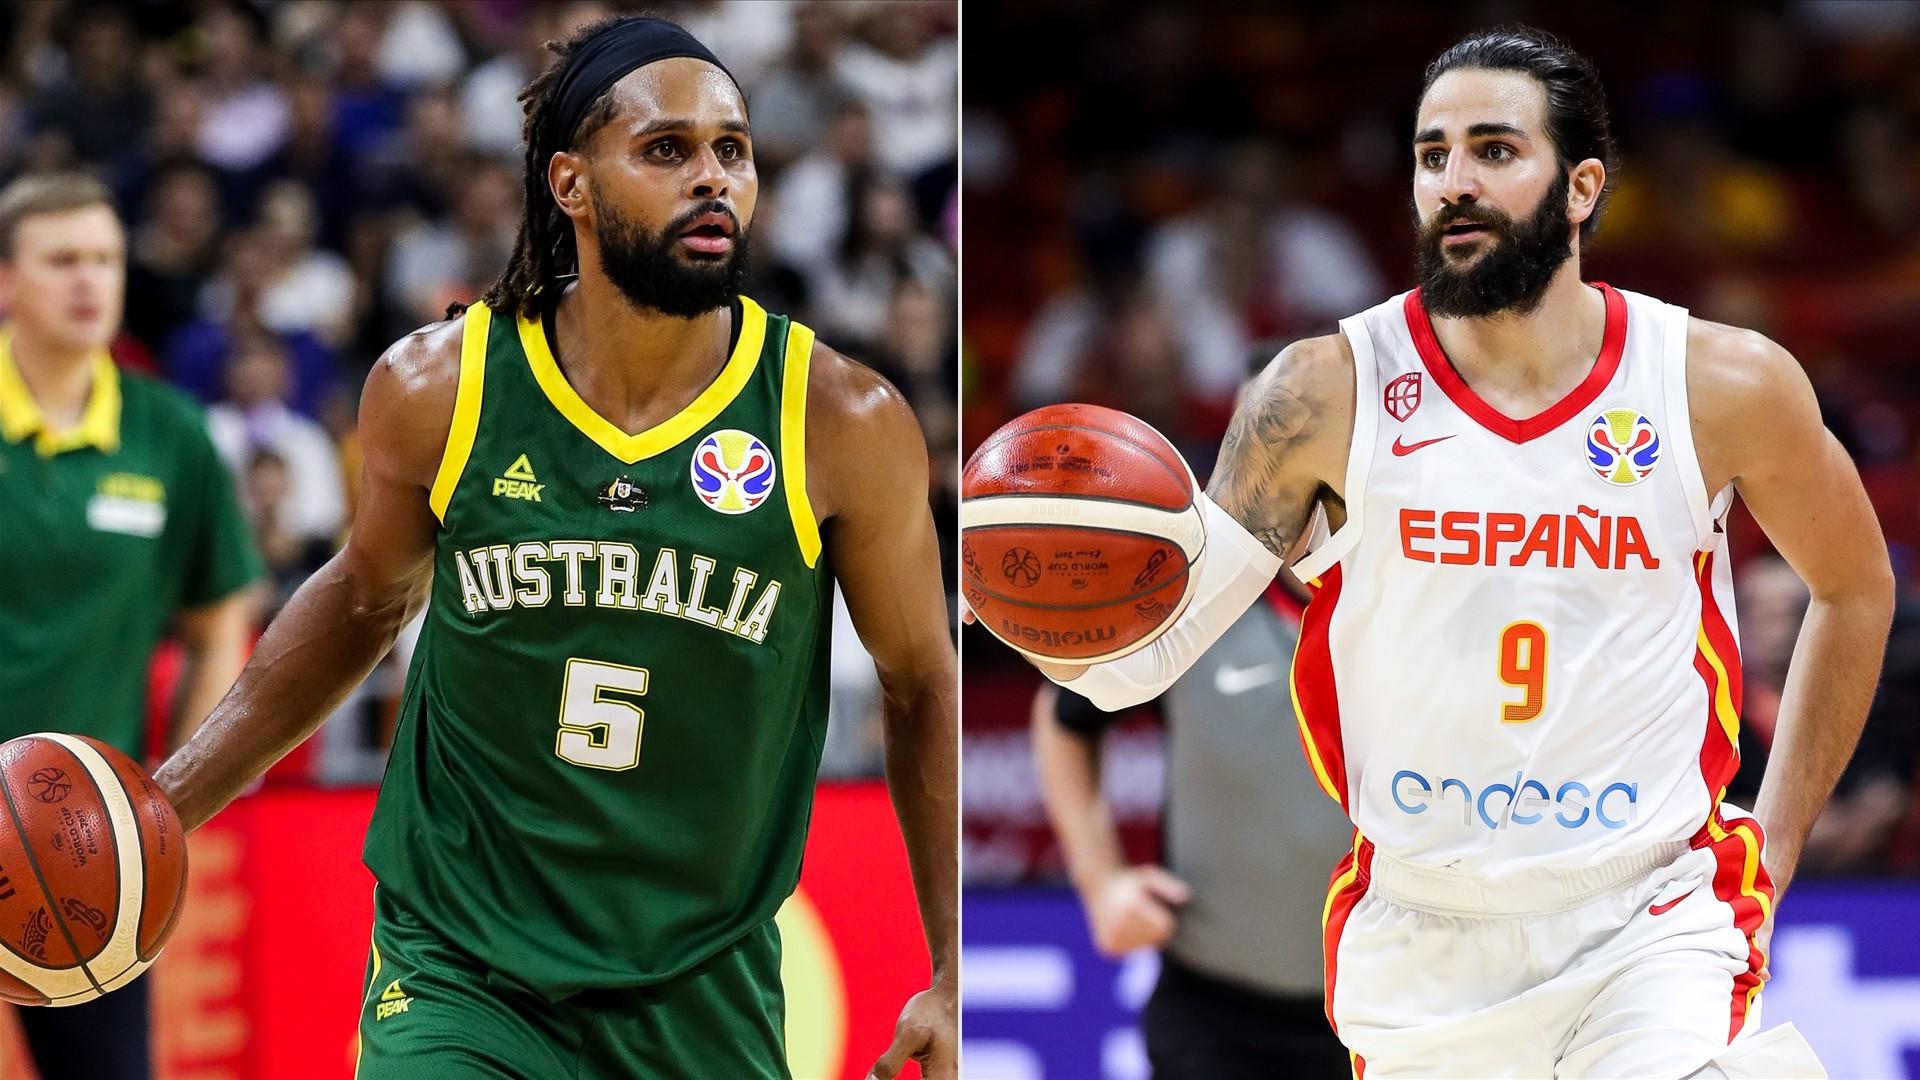 Fiba Basketball World Cup 2019 Australian Boomers Vs